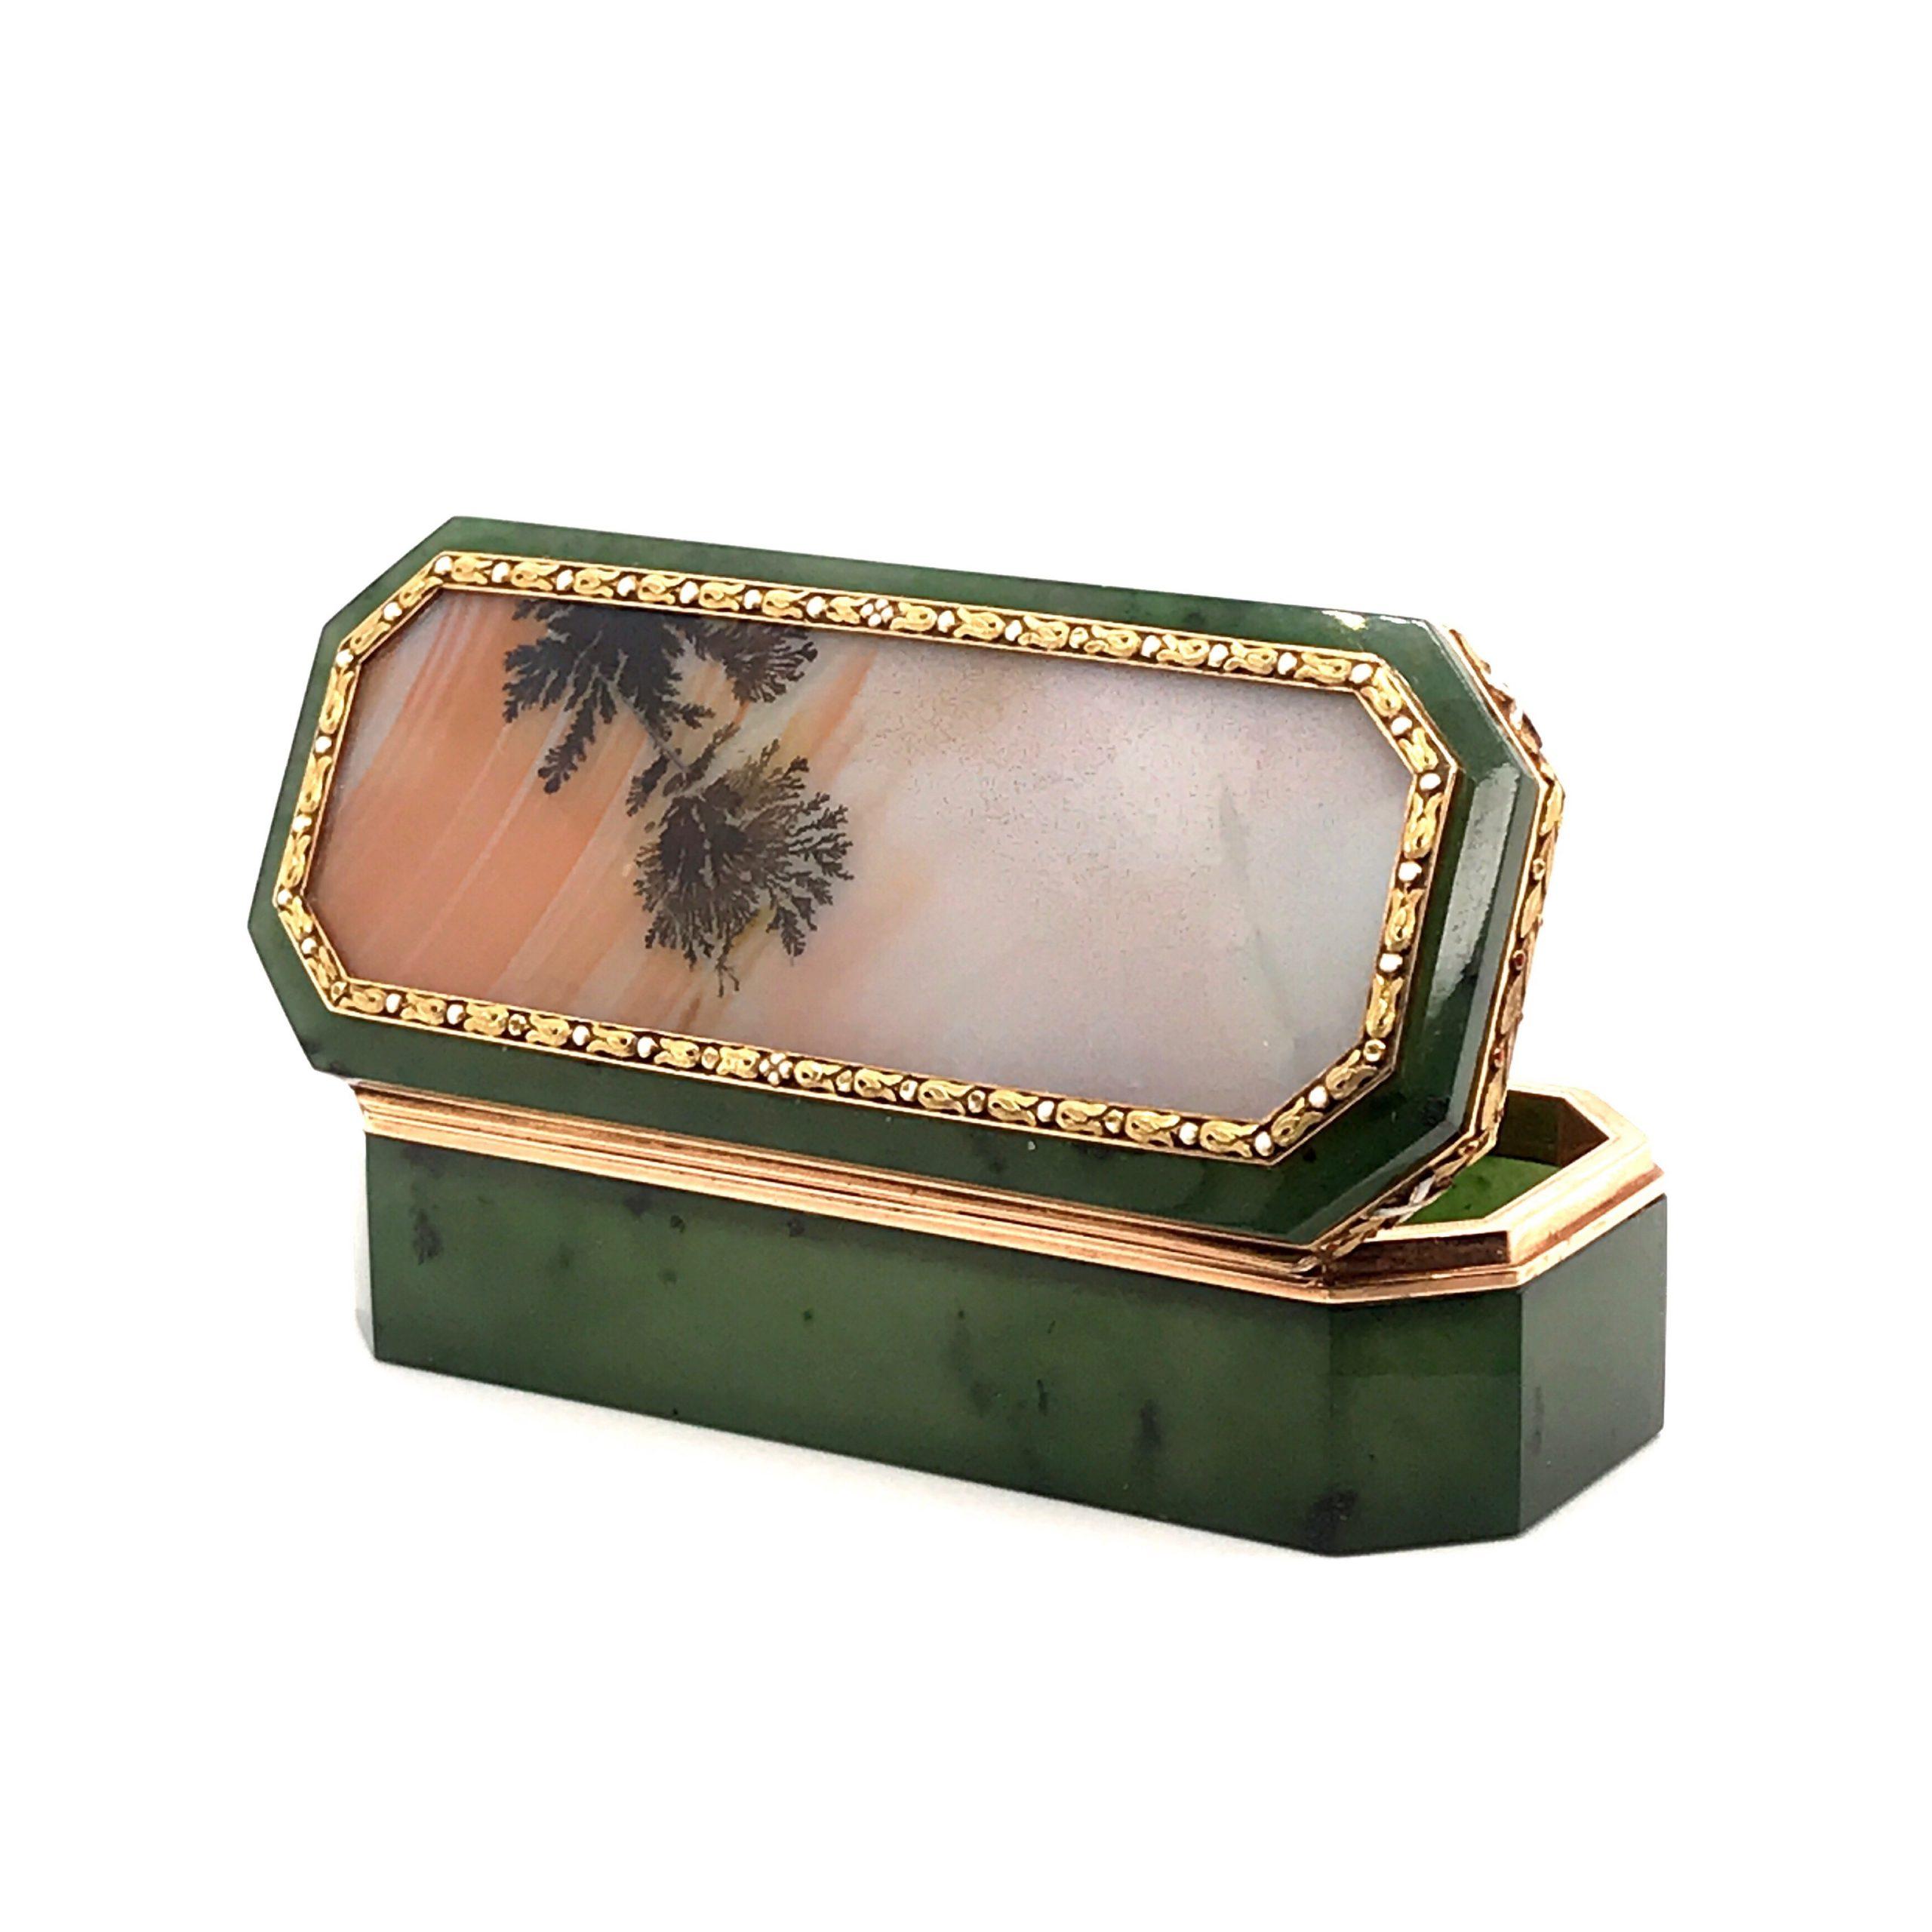 Faberge, Carl Faberge